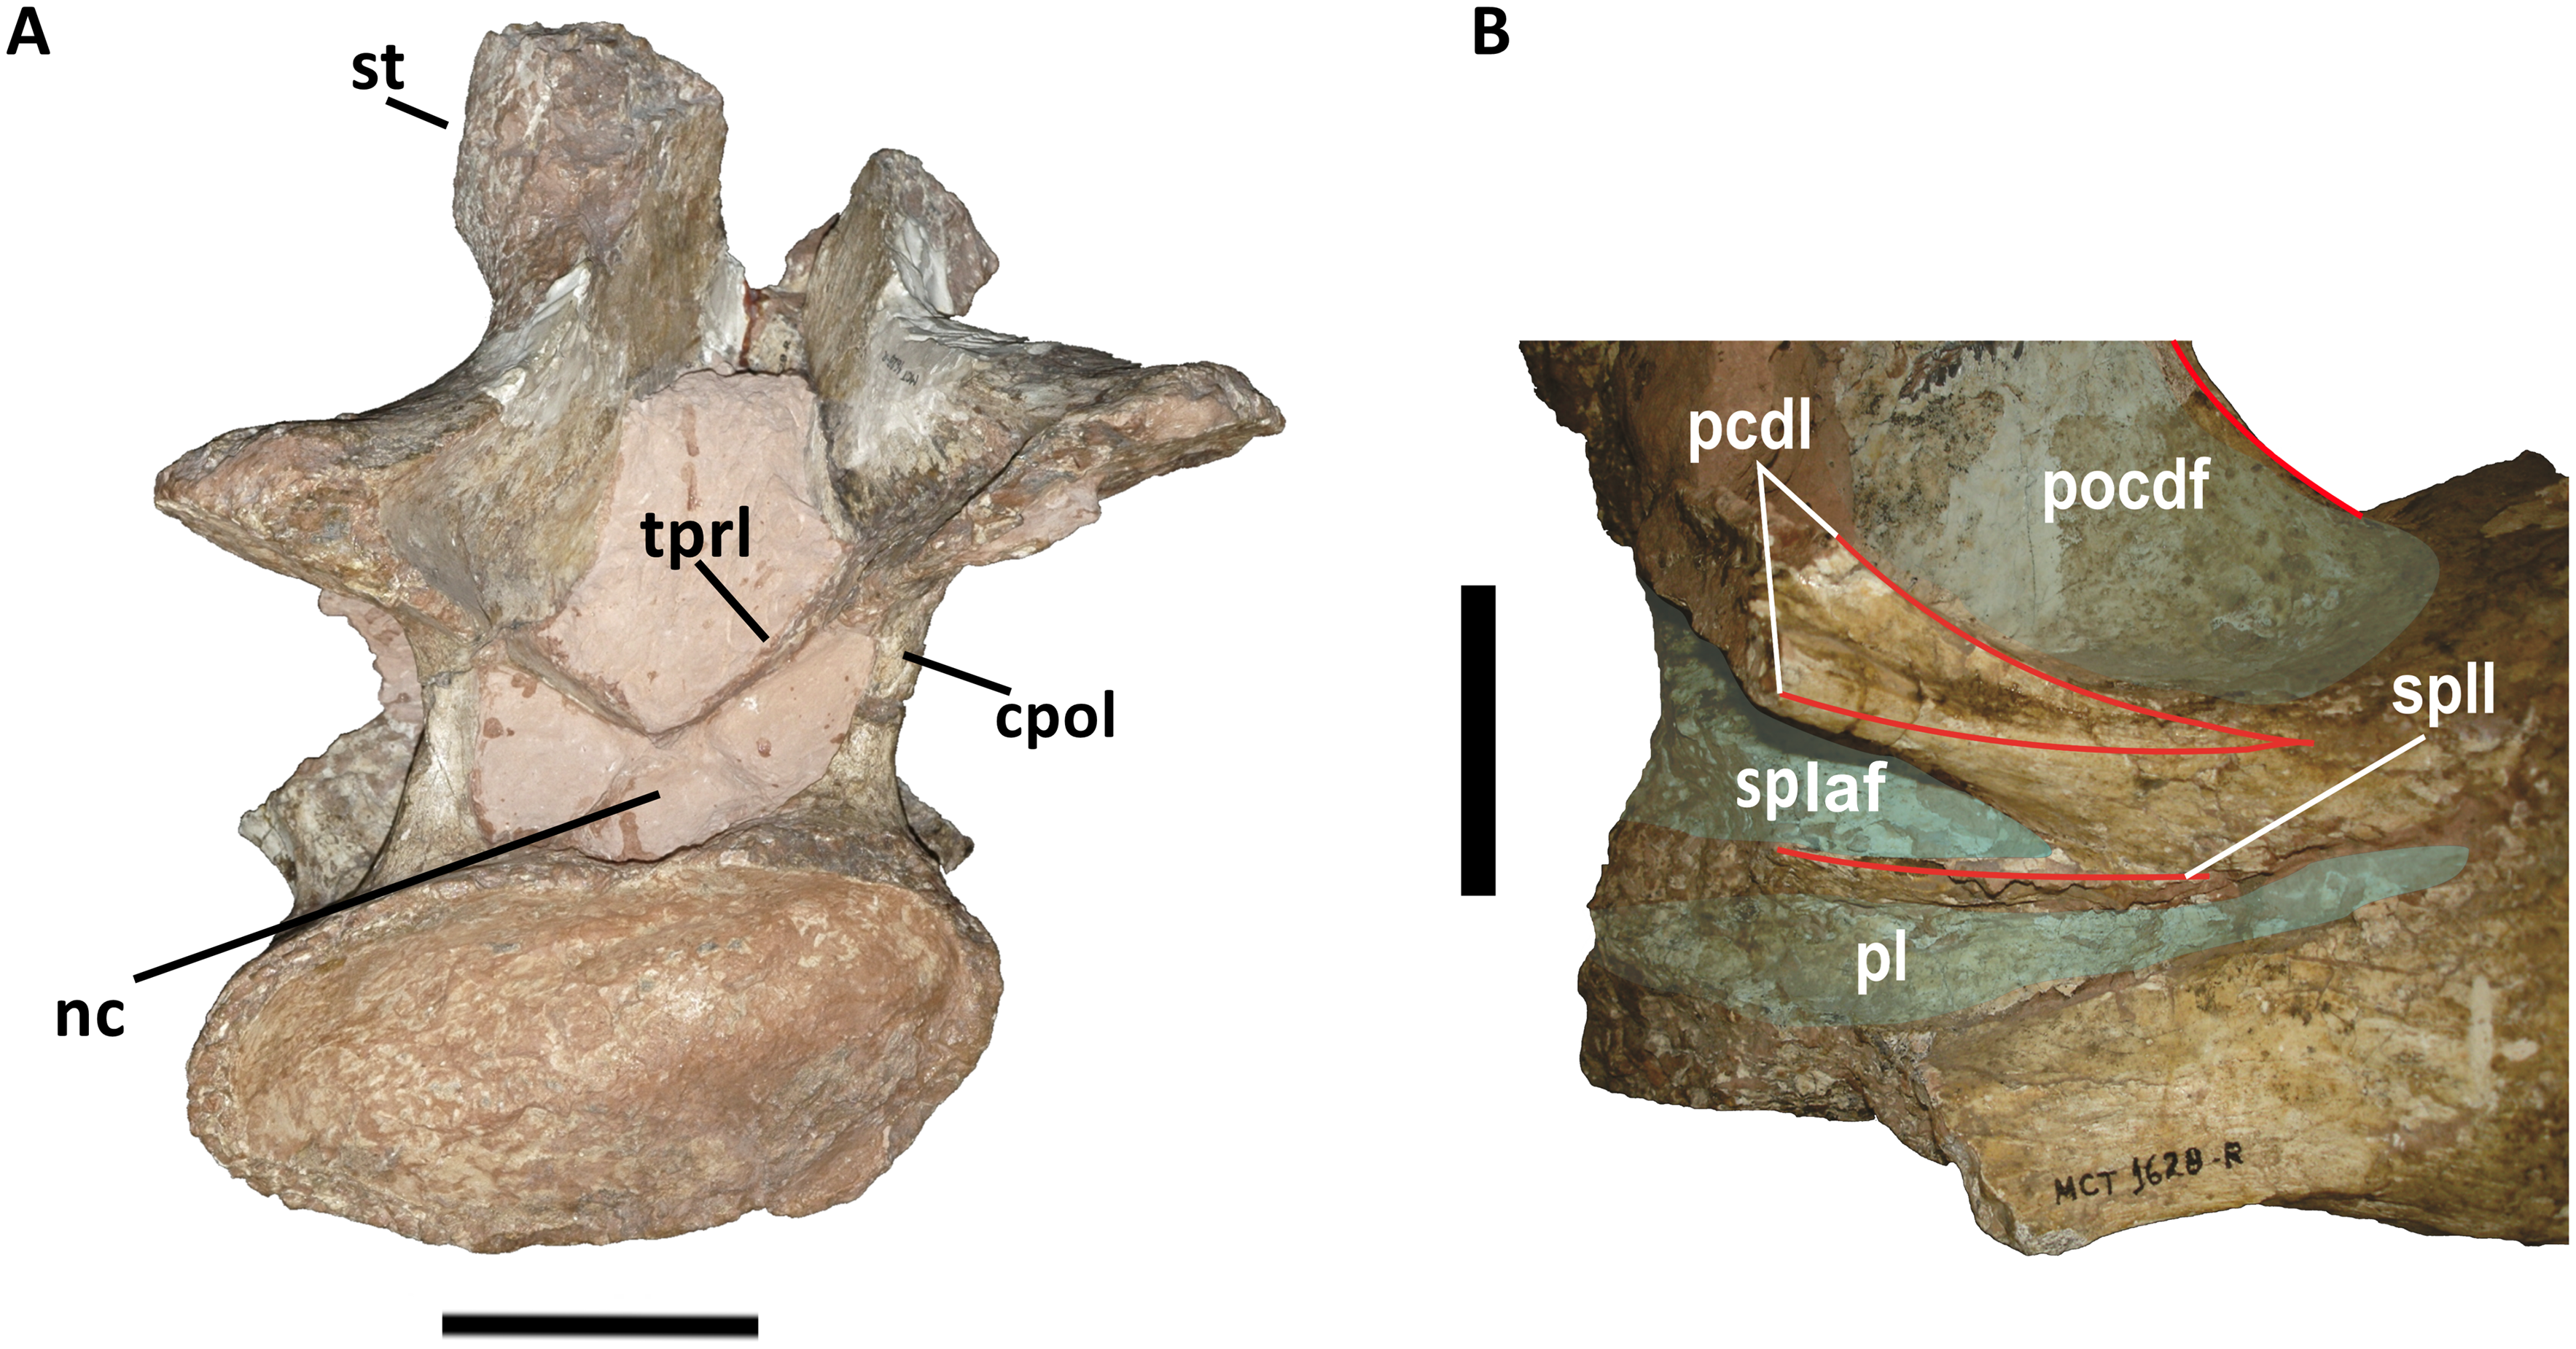 Hinterster Halswirbel des Titanosauriers Austrotitan magnificus. Bildquelle: Bandeira et al. 2016